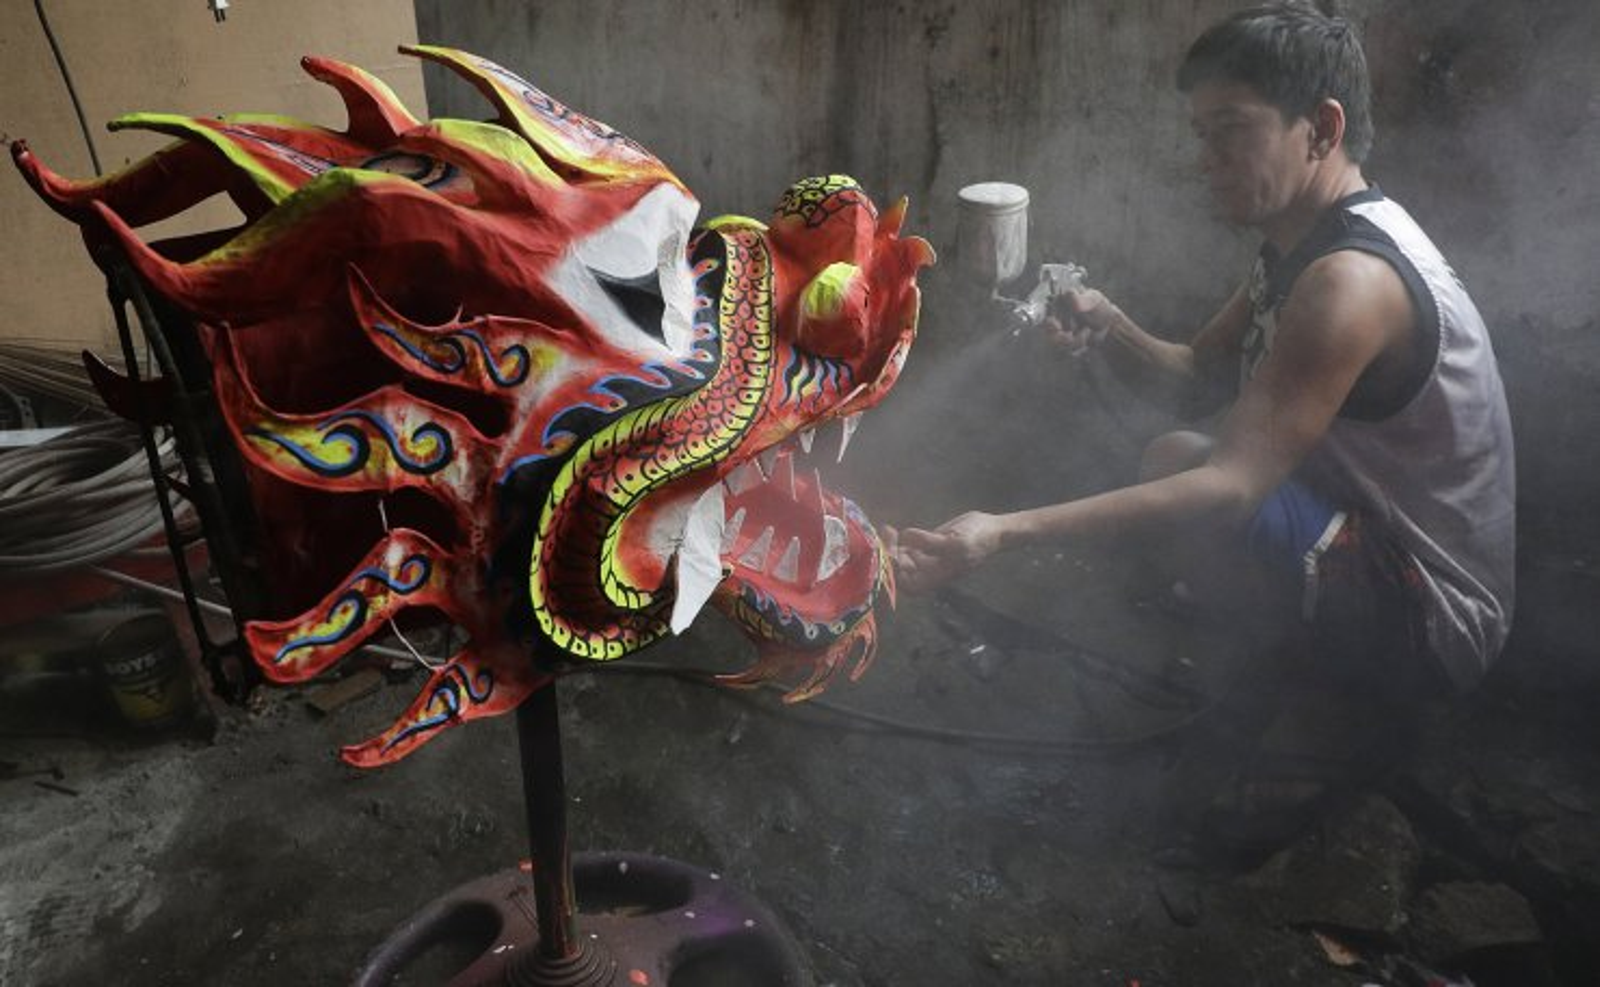 Robert Sicat sprays a protective coating on a Dragon head at a creekside slum at Manila's Chinatown, Binondo Philippines on Feb. 4, 2021. AP